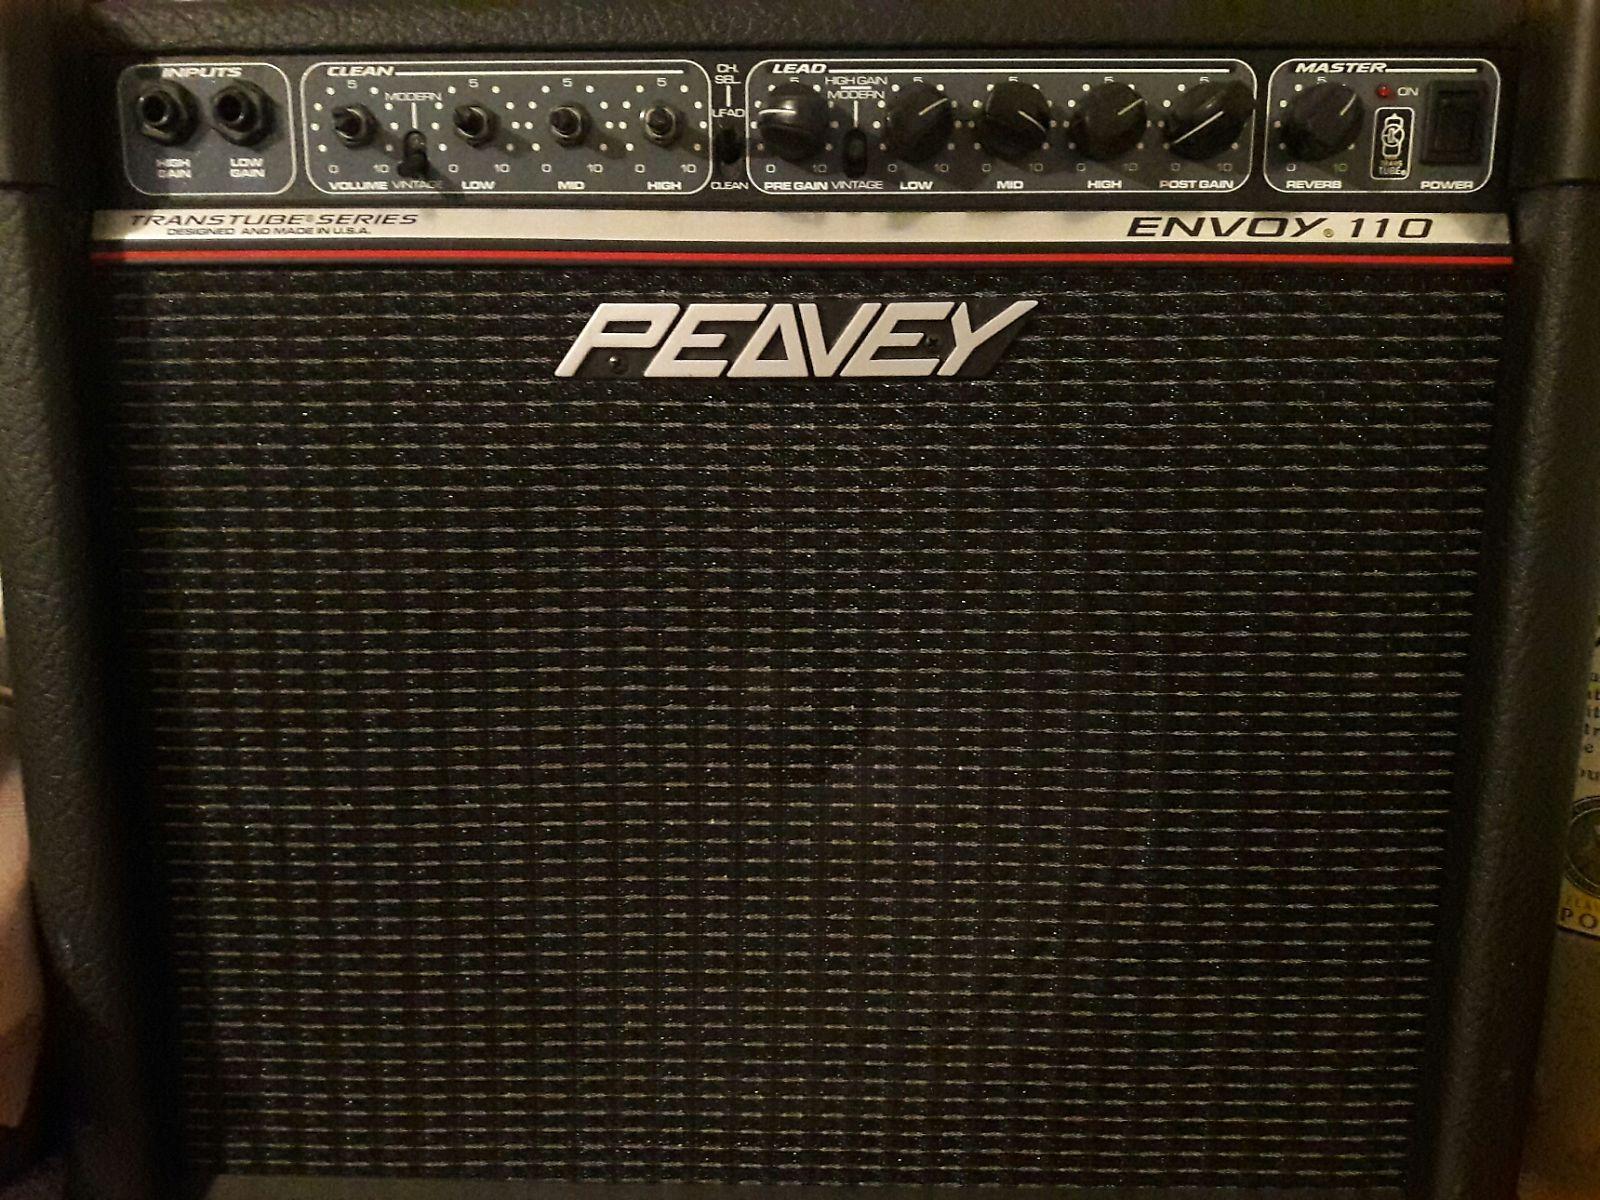 peavey envoy 110 transtube series 40 watt 1x10 guitar combo reverb. Black Bedroom Furniture Sets. Home Design Ideas